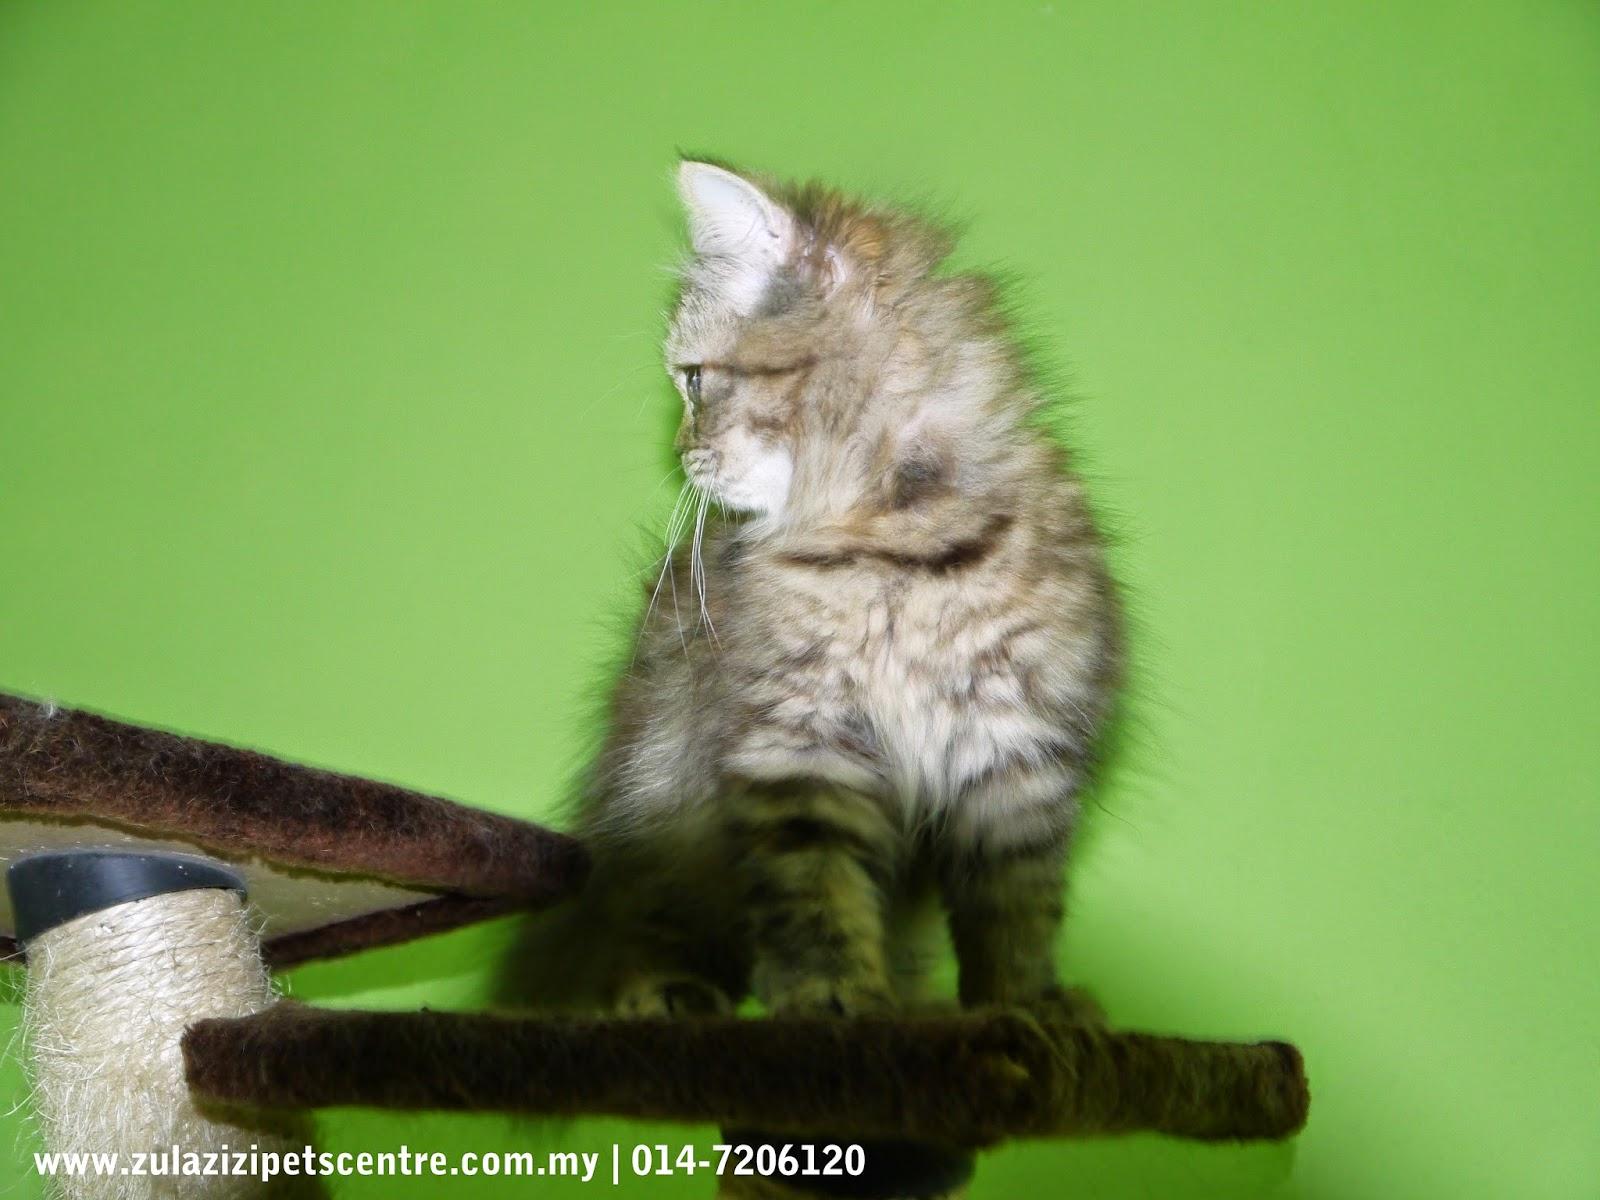 Anak Kucing Parsi Untuk Di Jual Zul Amp Azizi Boarding Pets